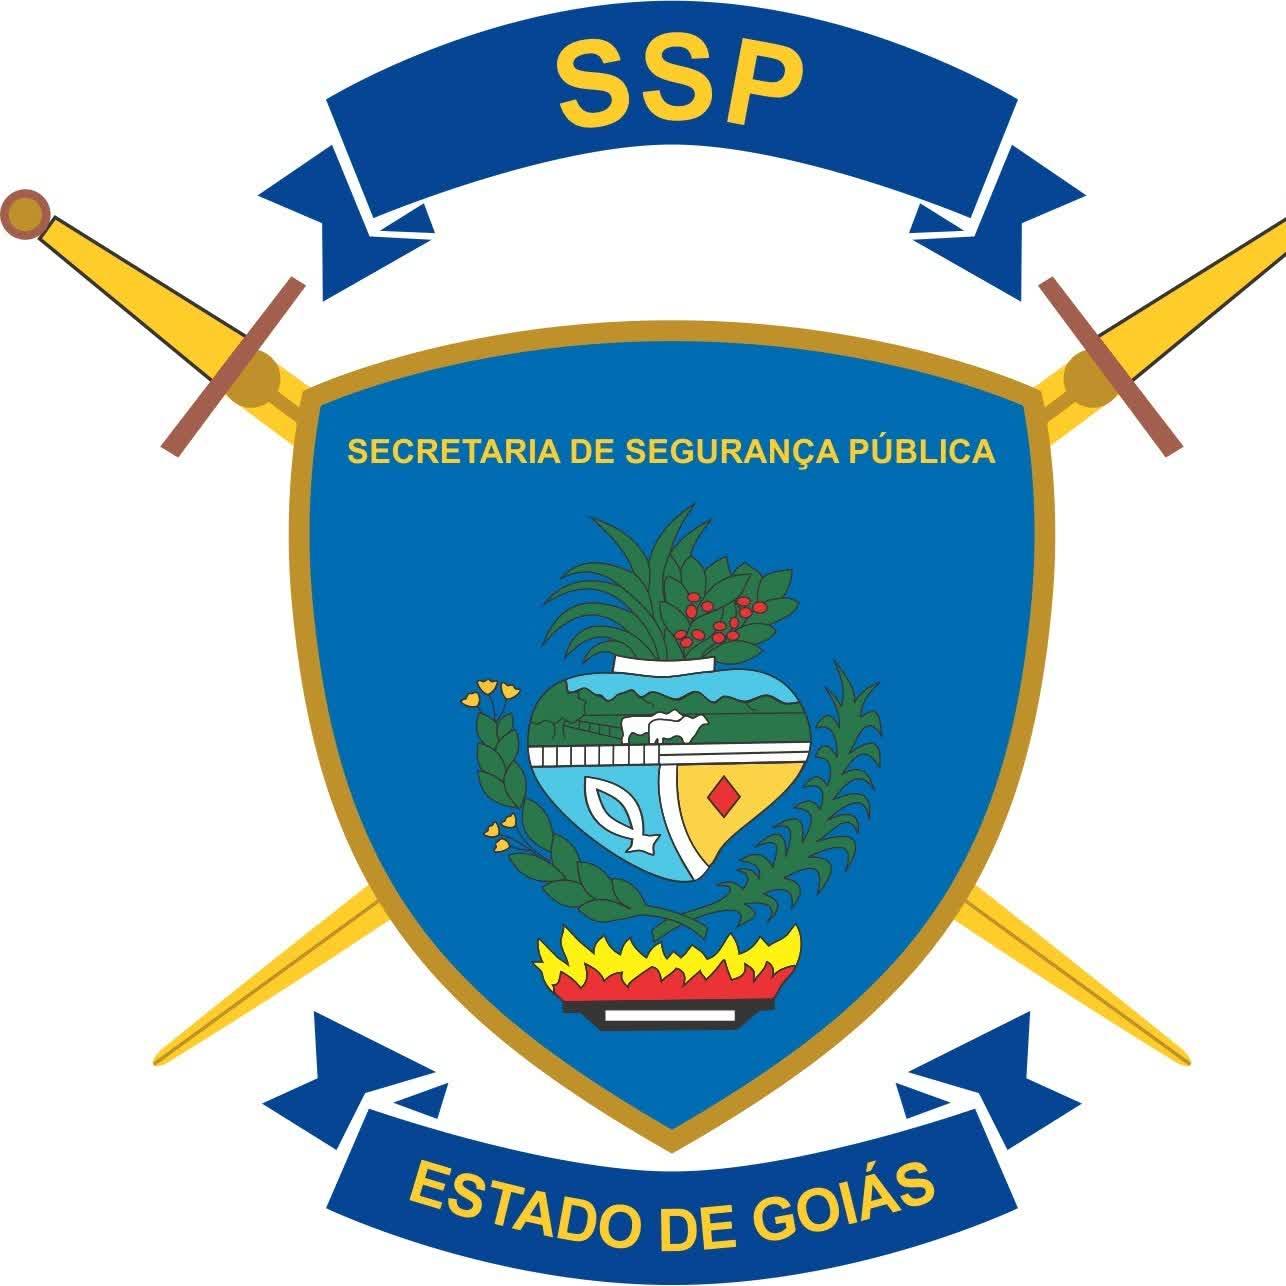 SSP Goiás